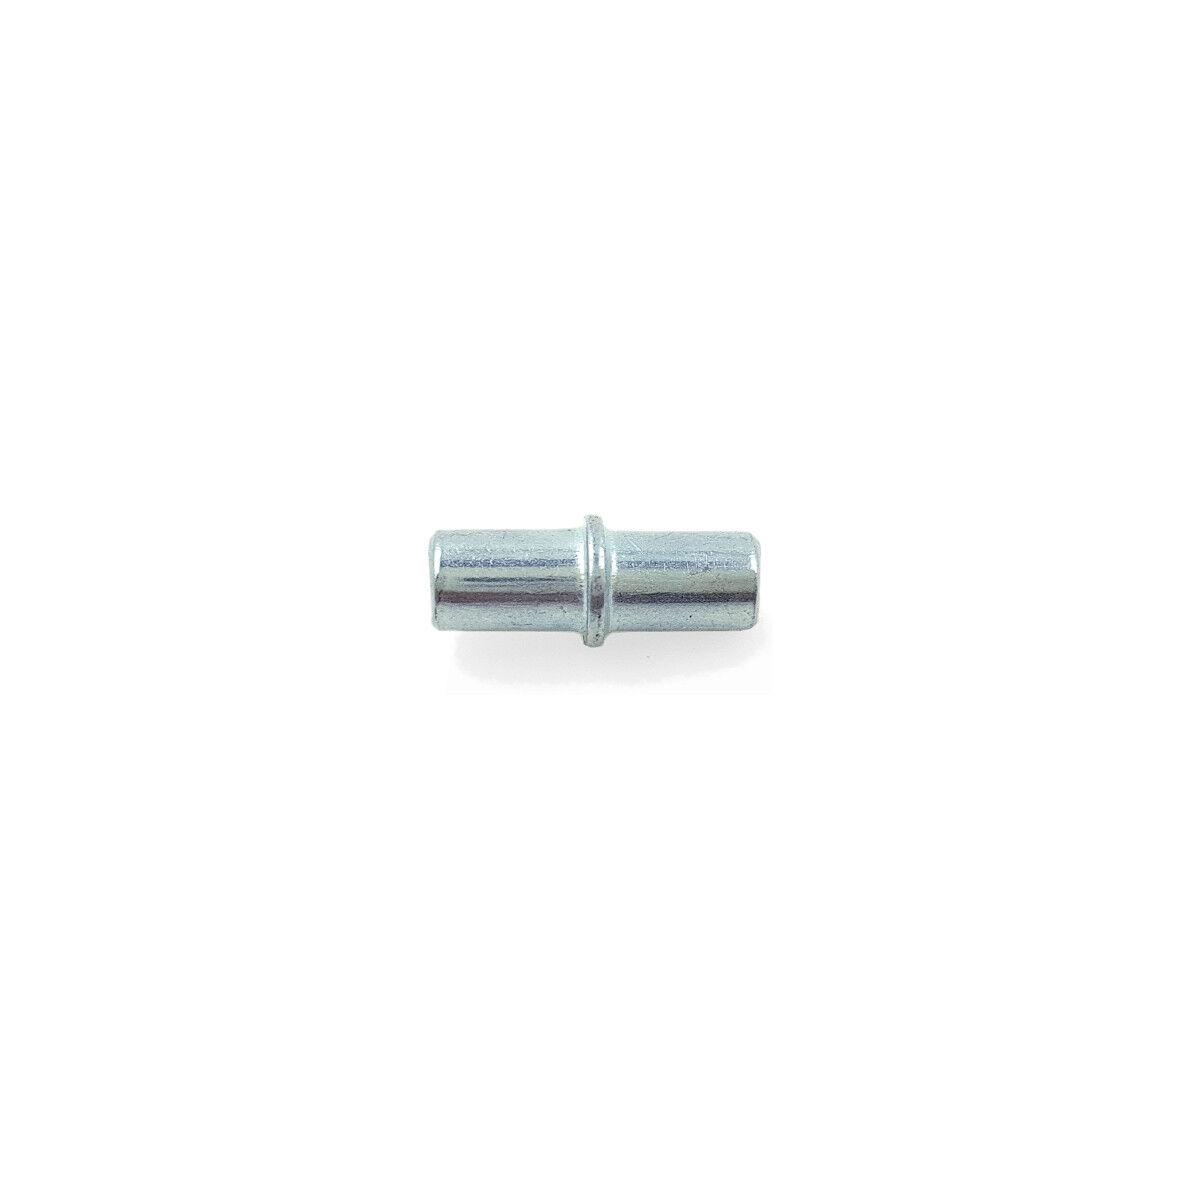 2000pcs 5mm Zinc Plated Split-Collar Cabinet Shelf Support Pin Peg